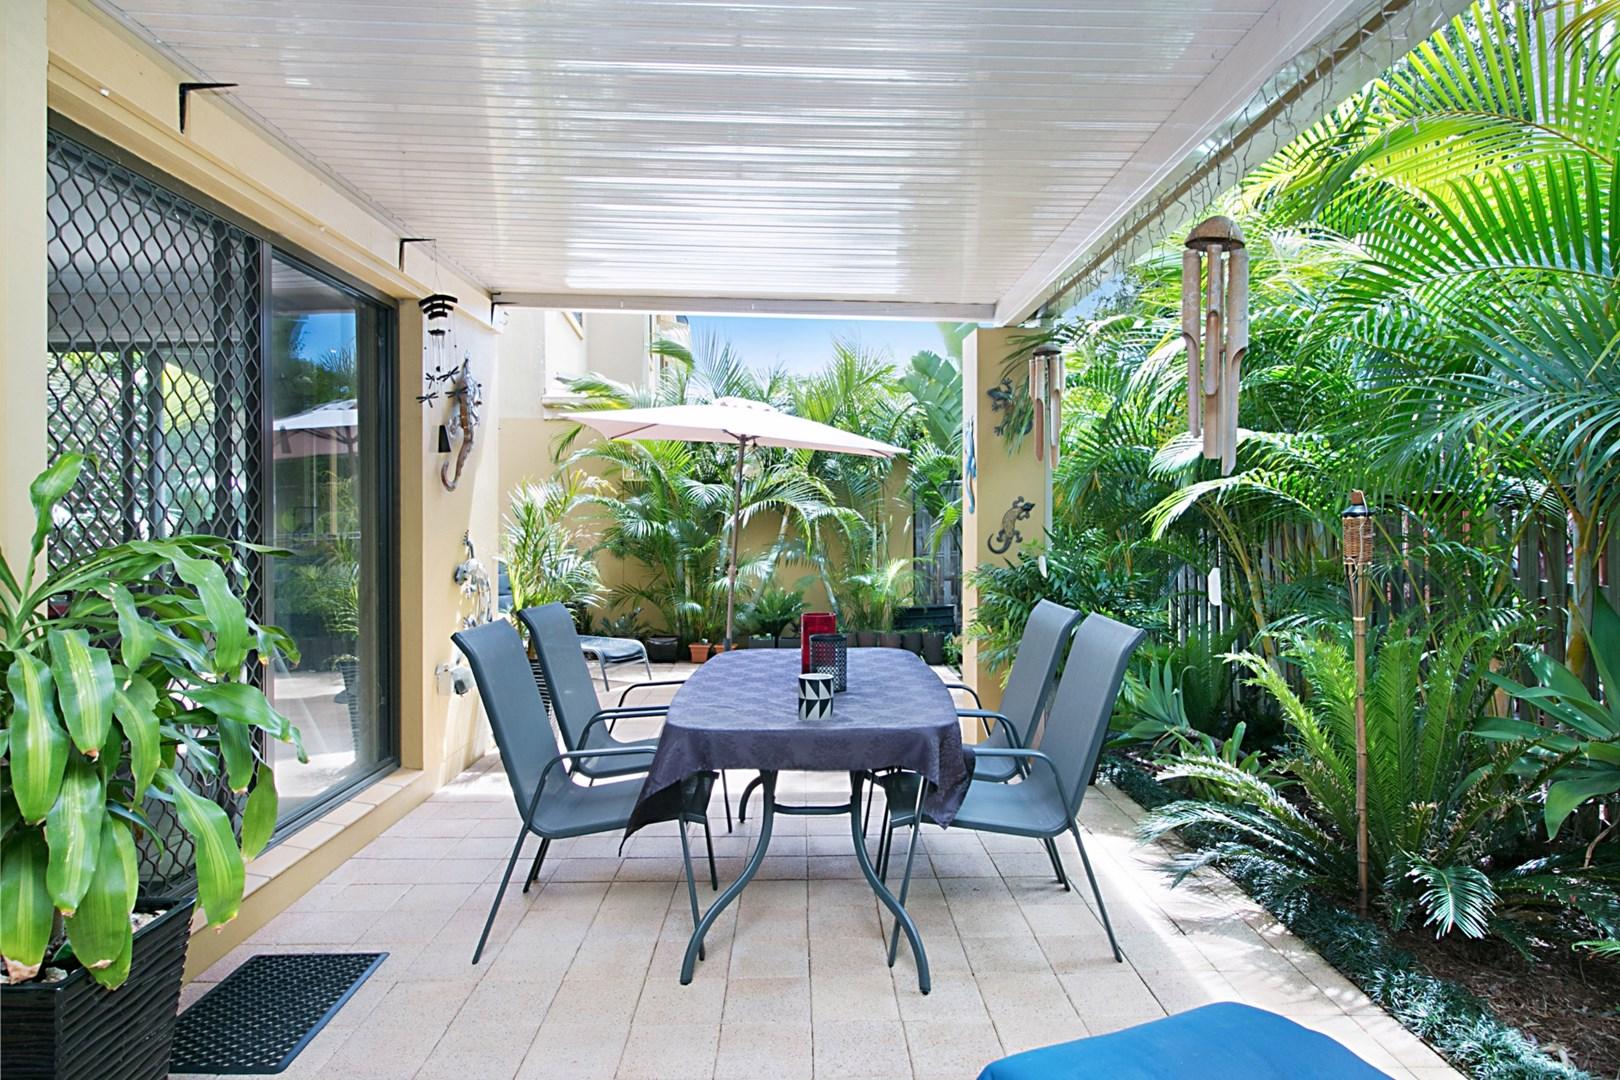 36/53 Paradise Springs Avenue, Robina QLD 4226, Image 0